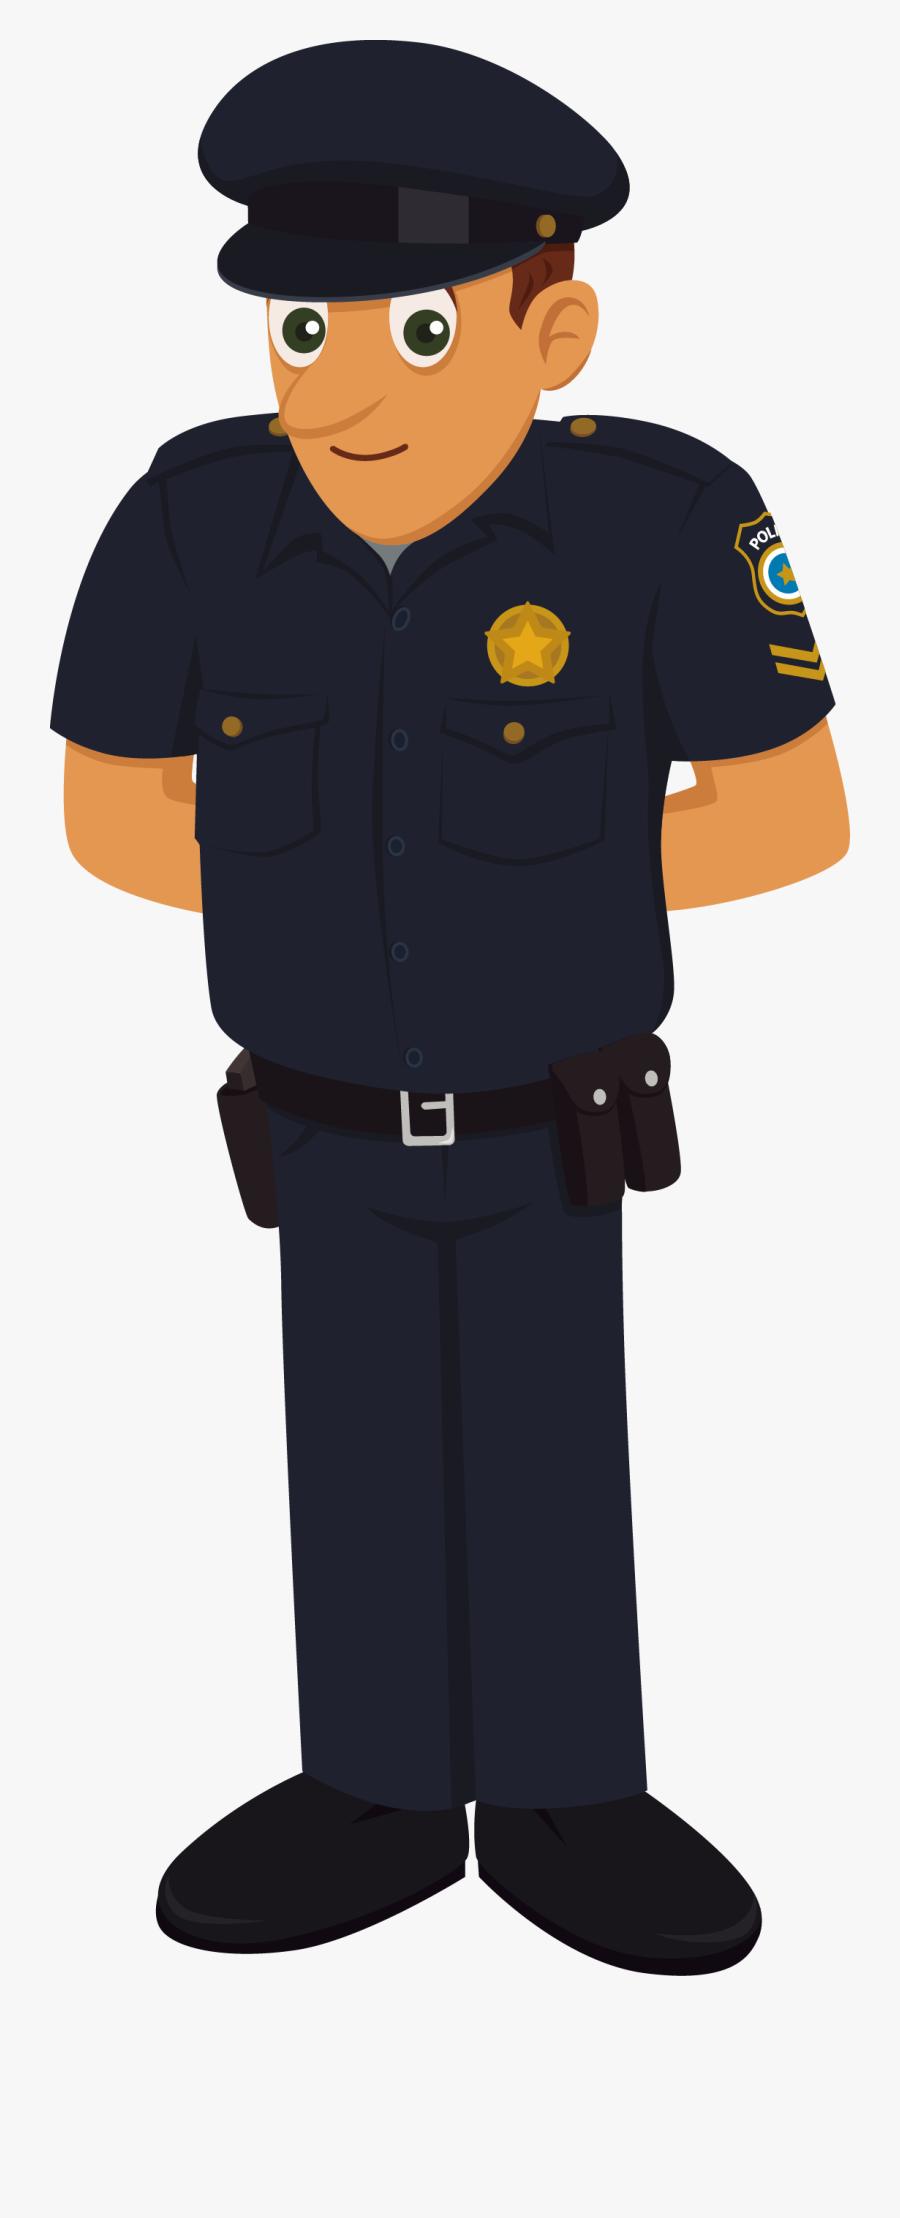 Collection Of Uniform - Indian Police Man Cartoon, Transparent Clipart